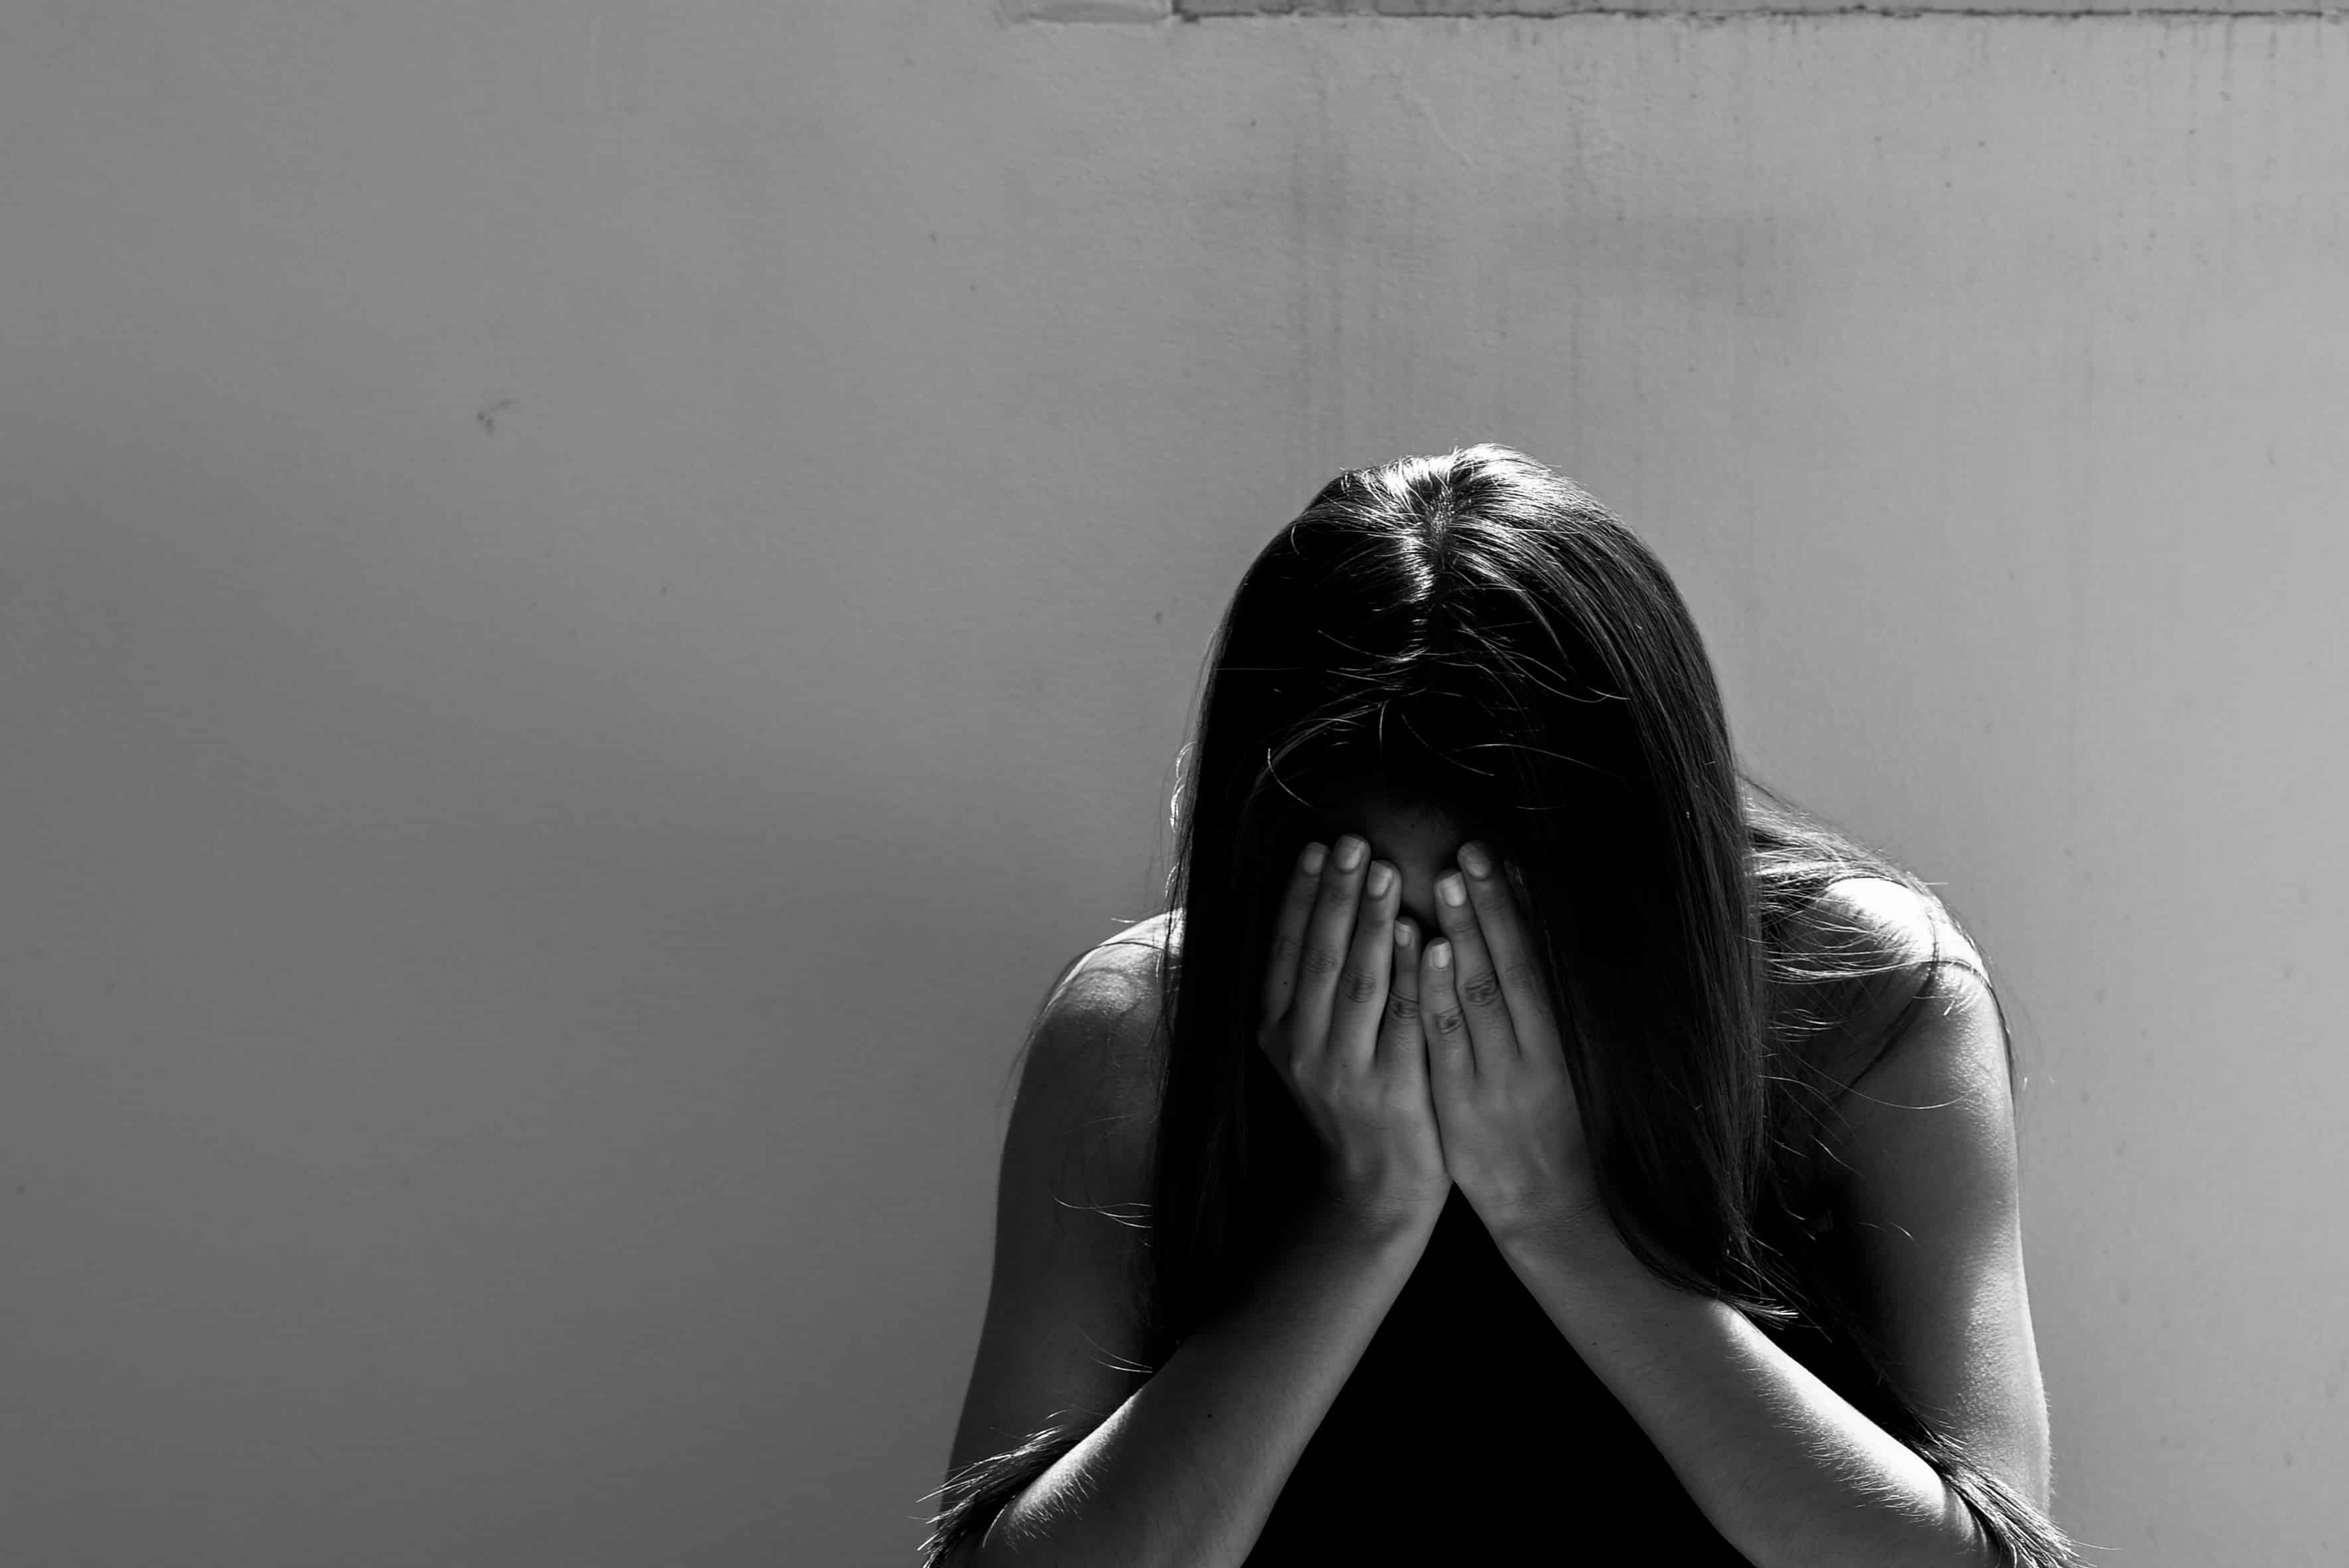 self-harm